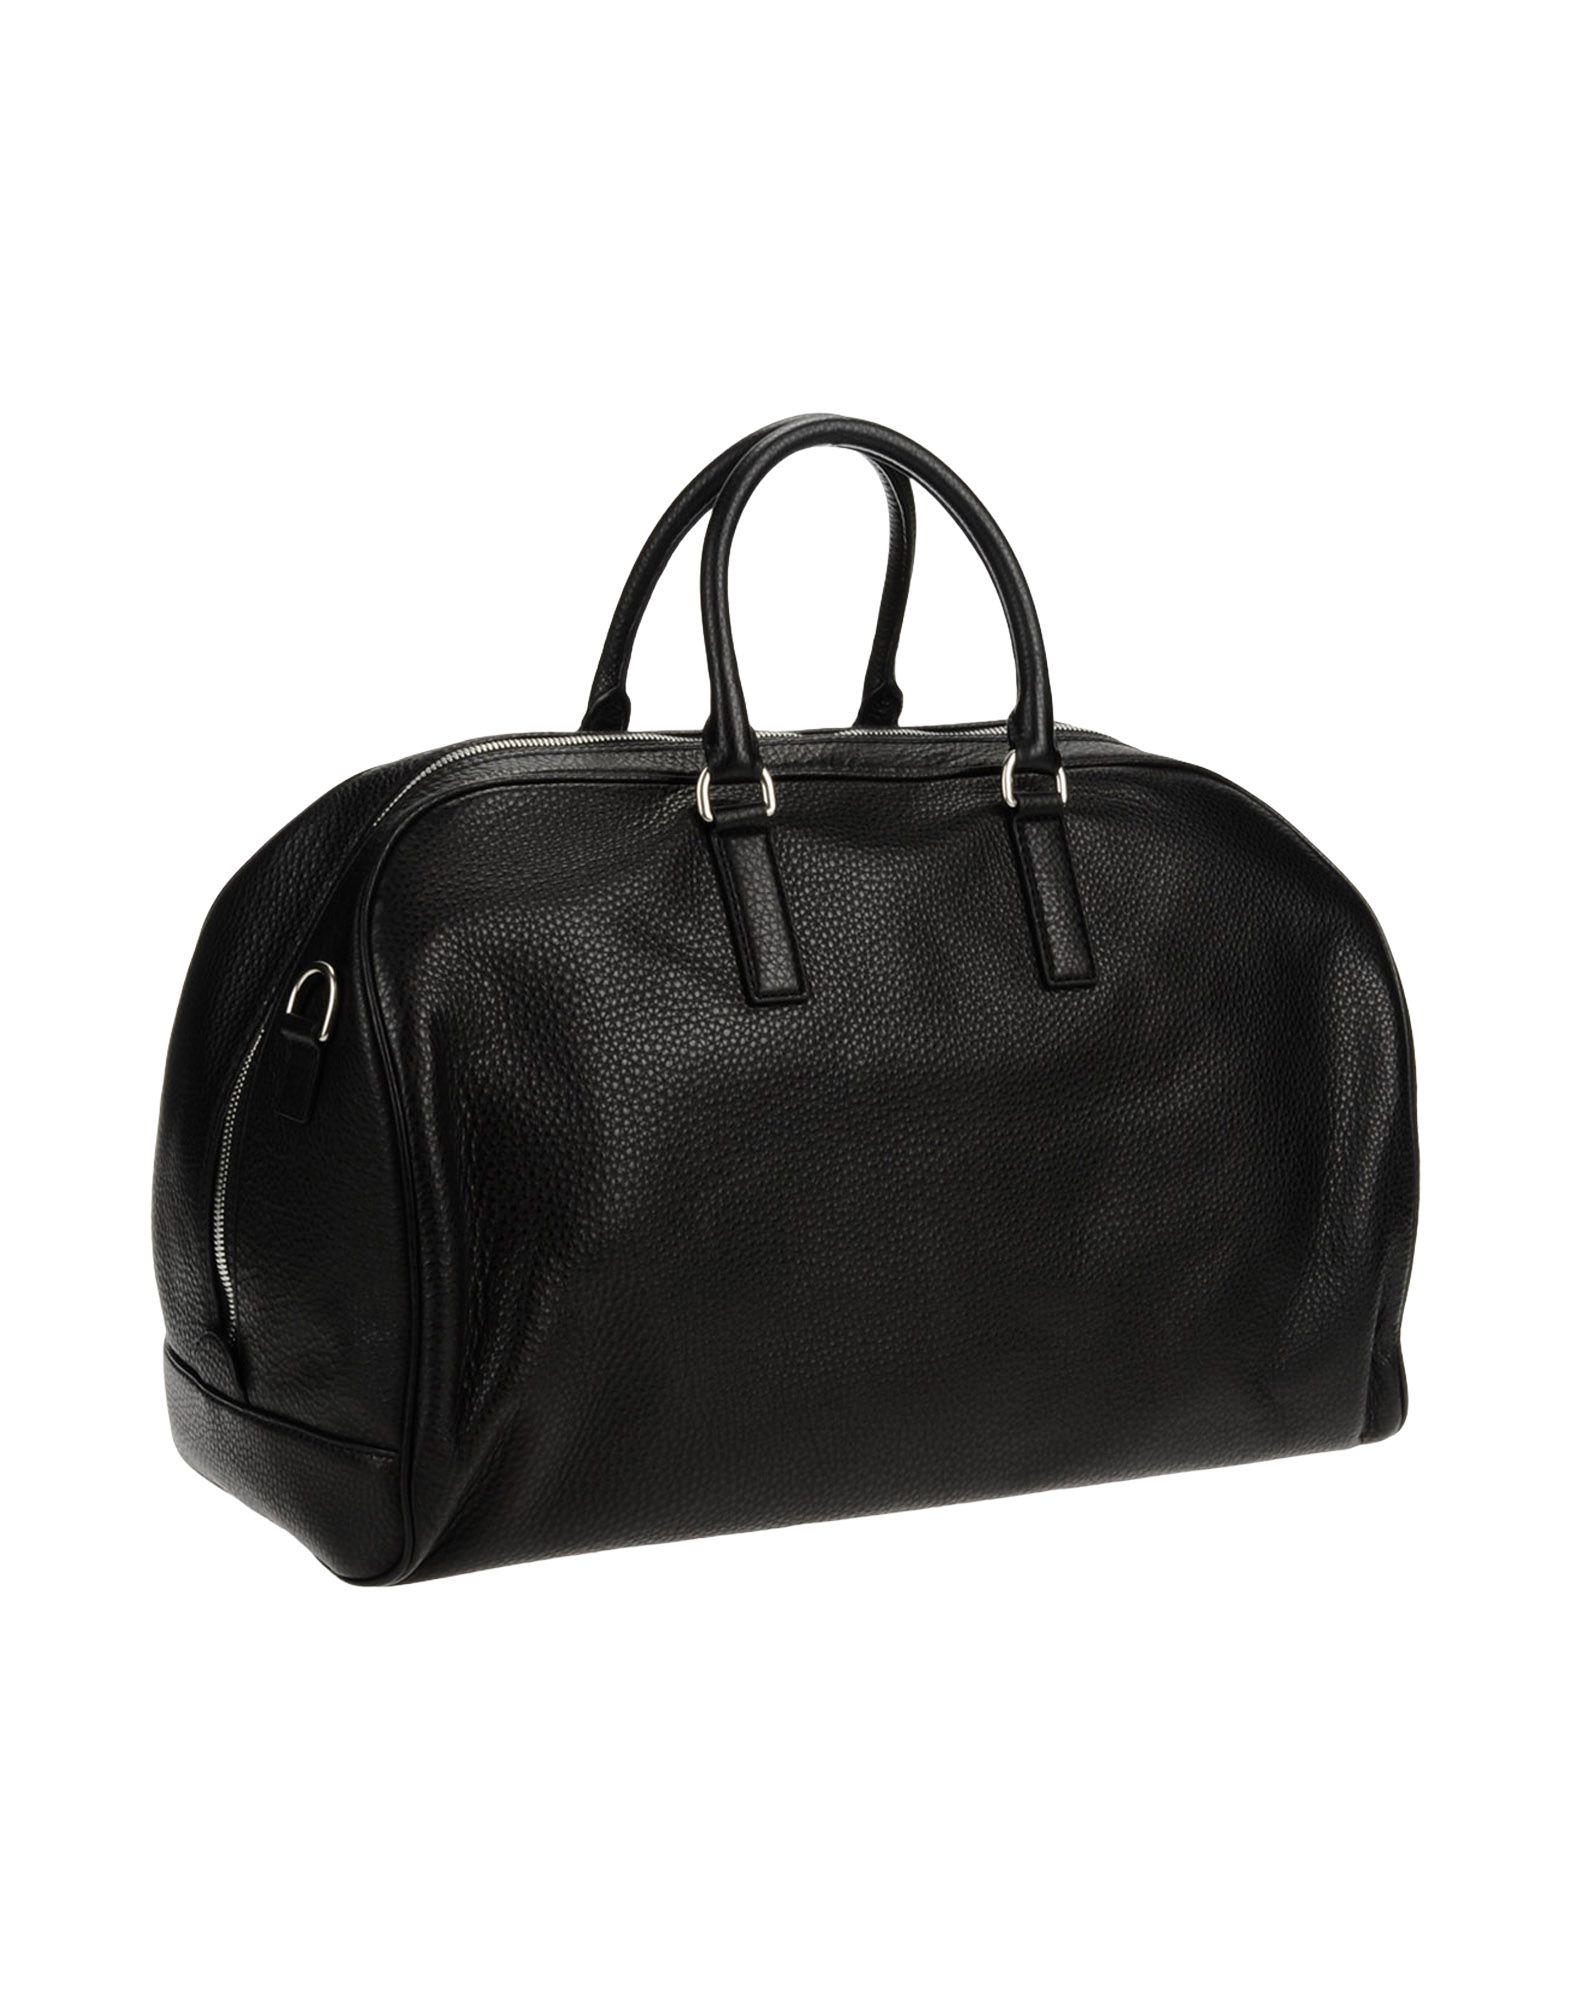 8861cc2cbb4d ... authentic lyst michael kors travel duffel bag in black for men a6022  2b01f